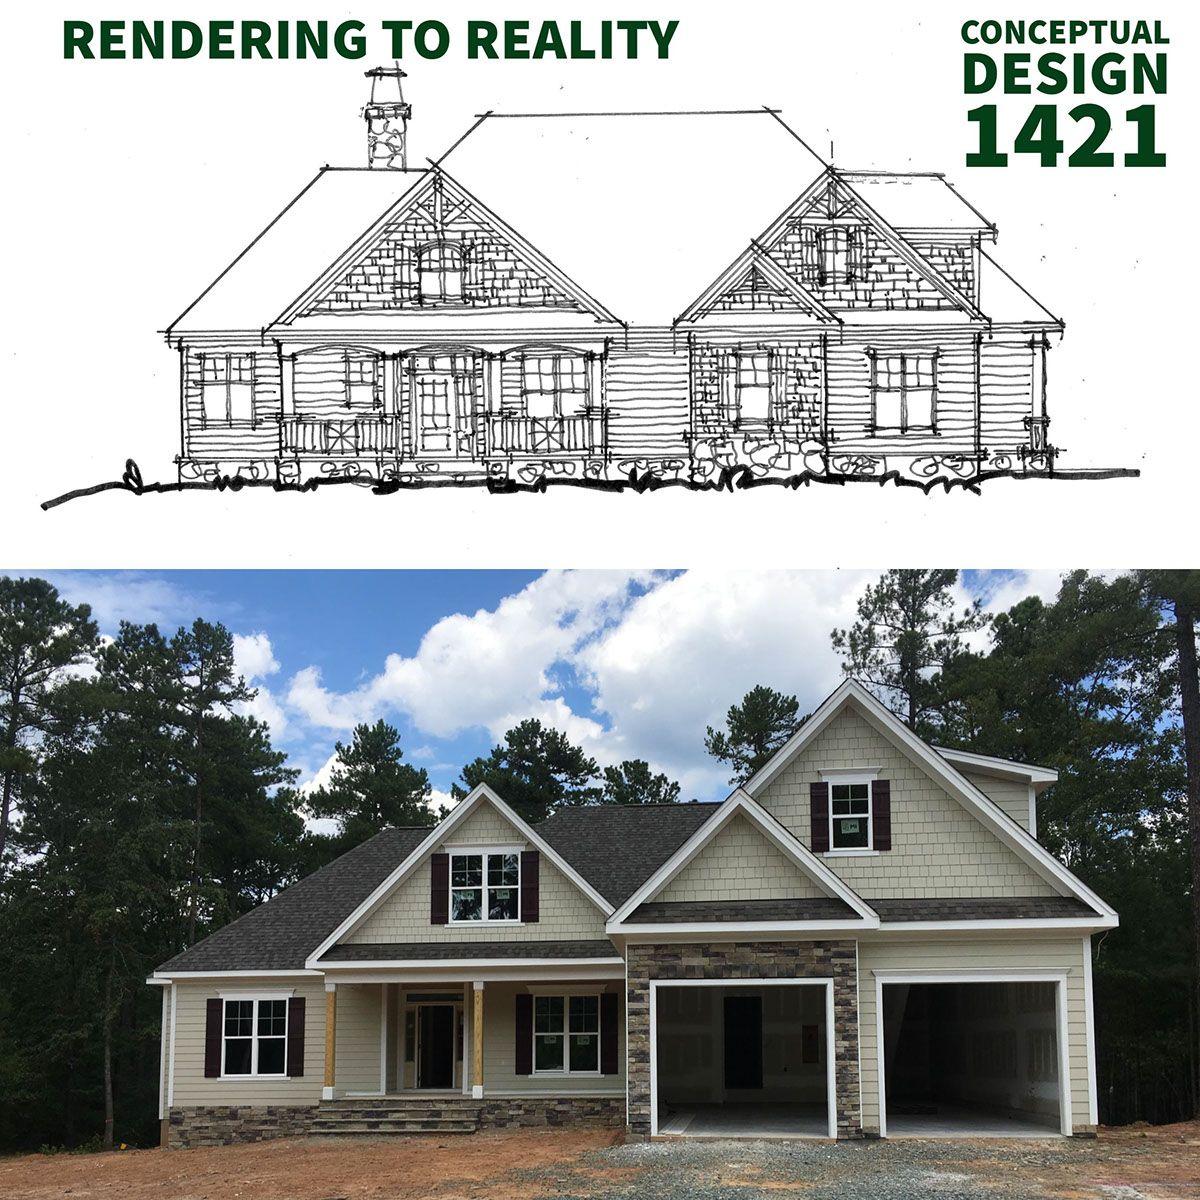 house conceptual design - Conceptual Design House